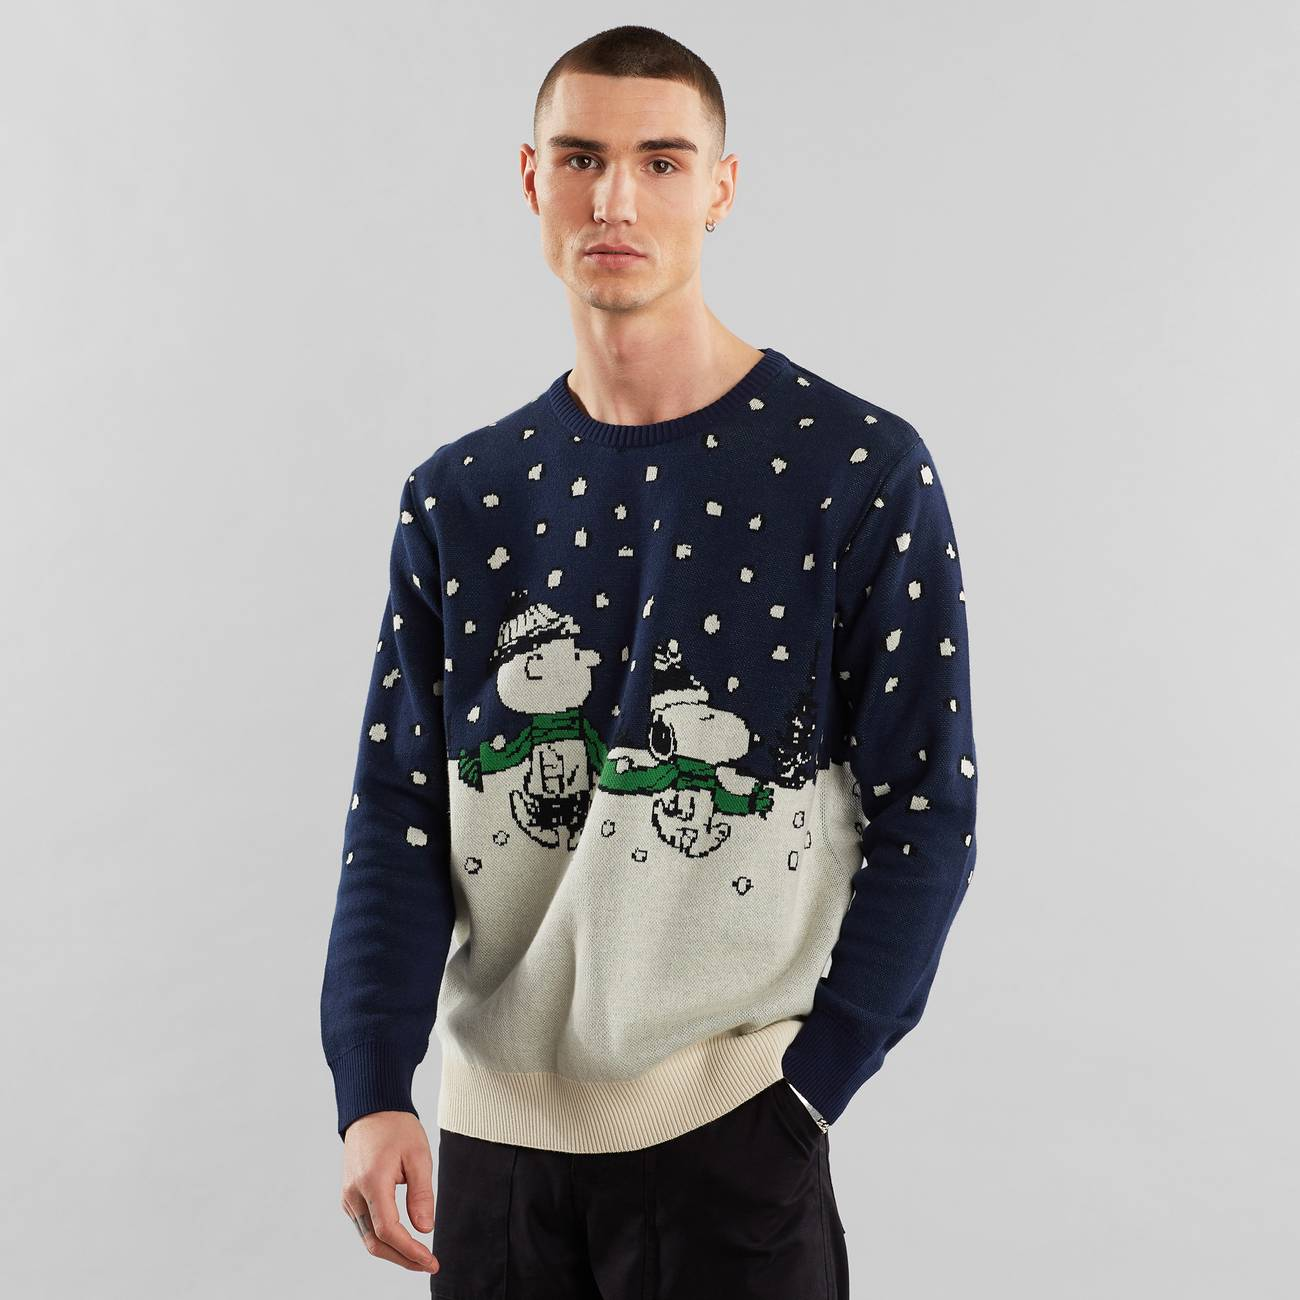 dedicated brand sweater